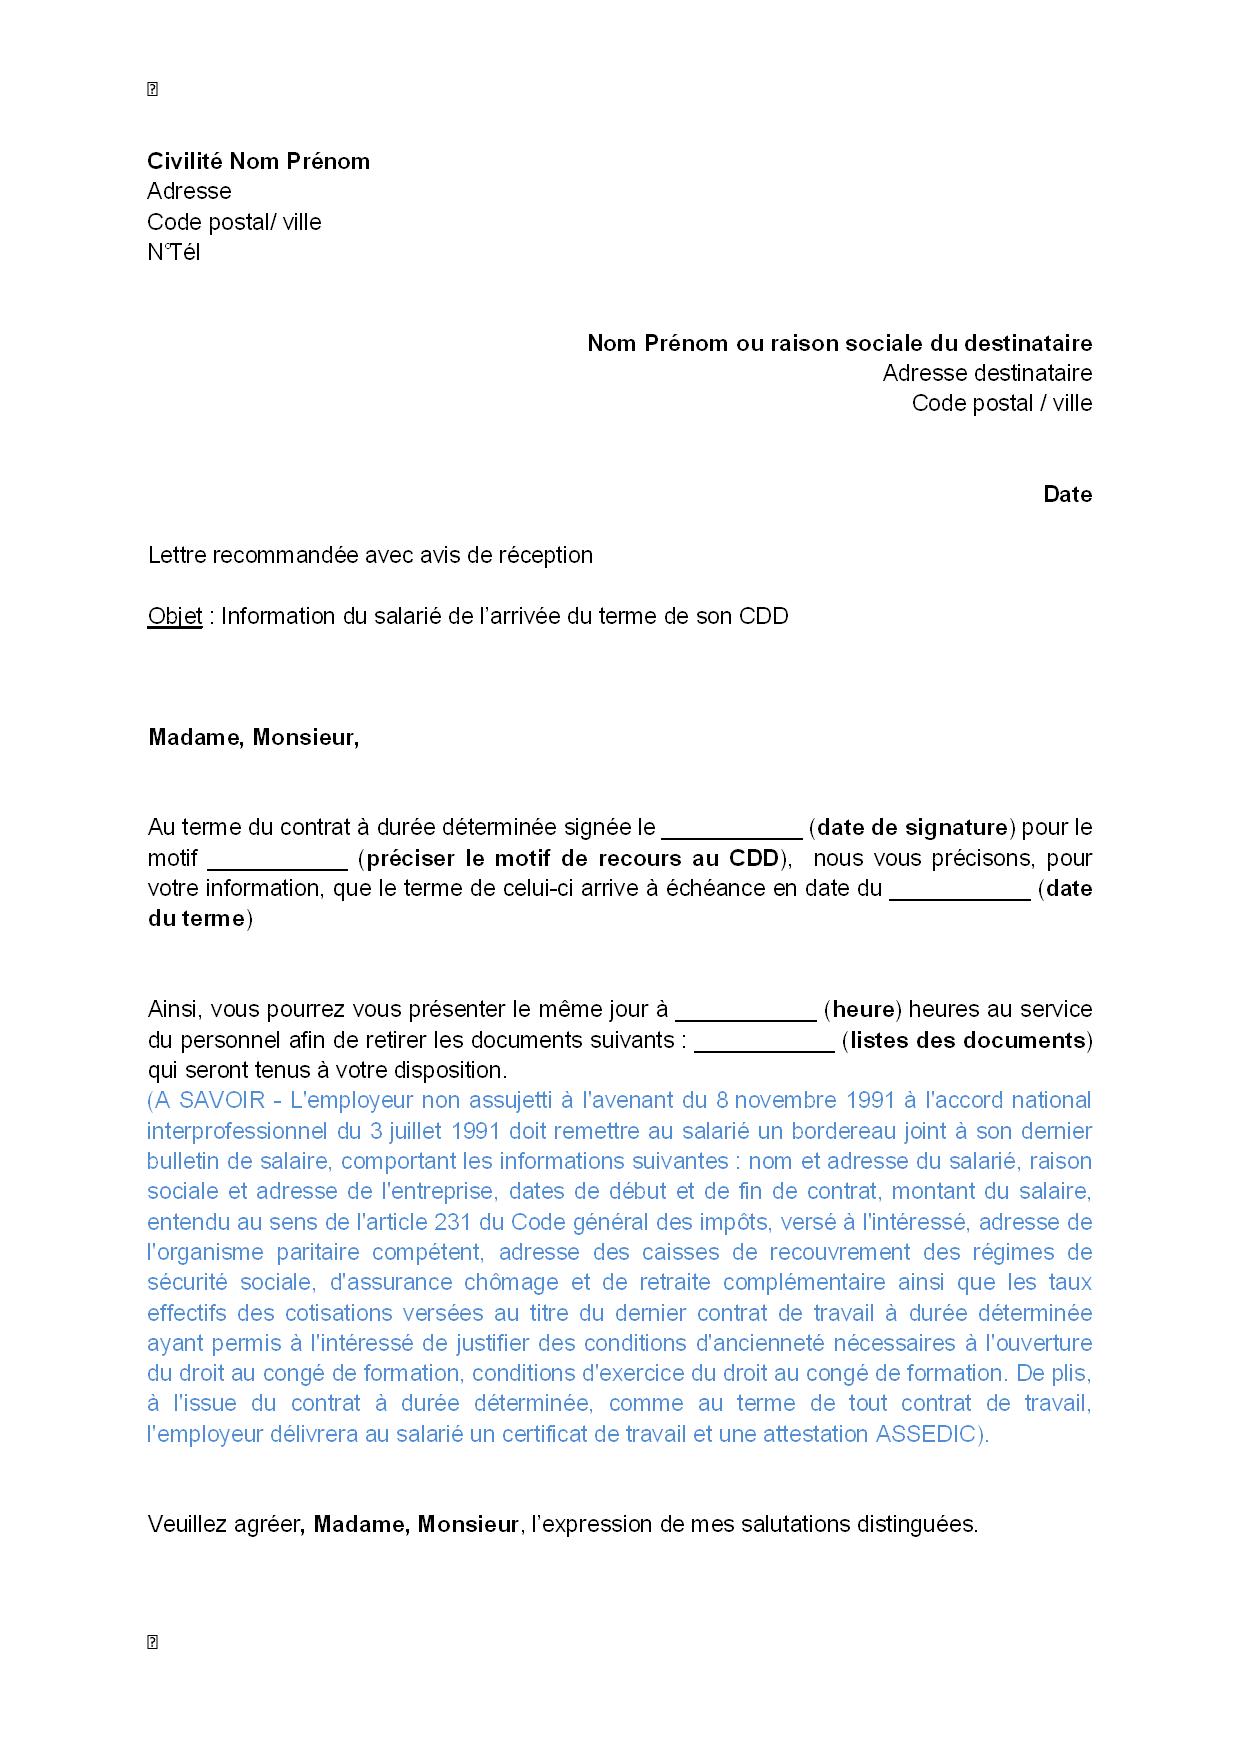 lettre informant le salari u00e9 de l u0026 39 arriv u00e9e du terme de son